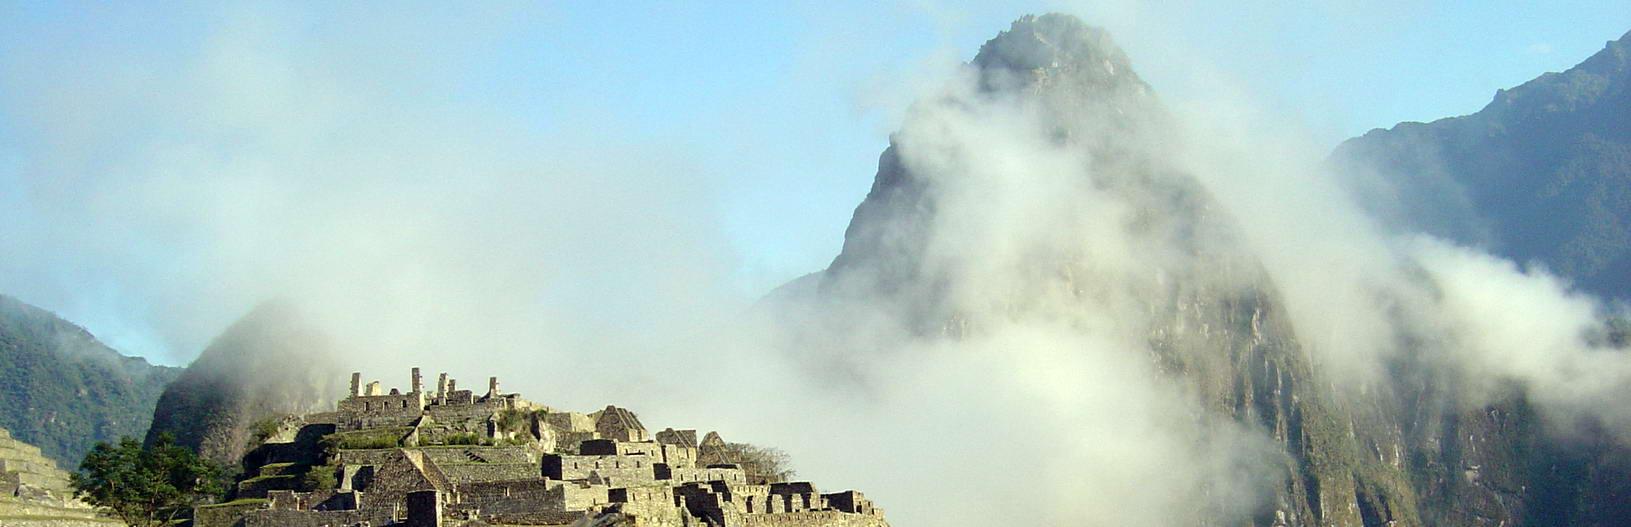 Ciudadela de Machu Picchu | Proyecto Ukhupacha (Perú)